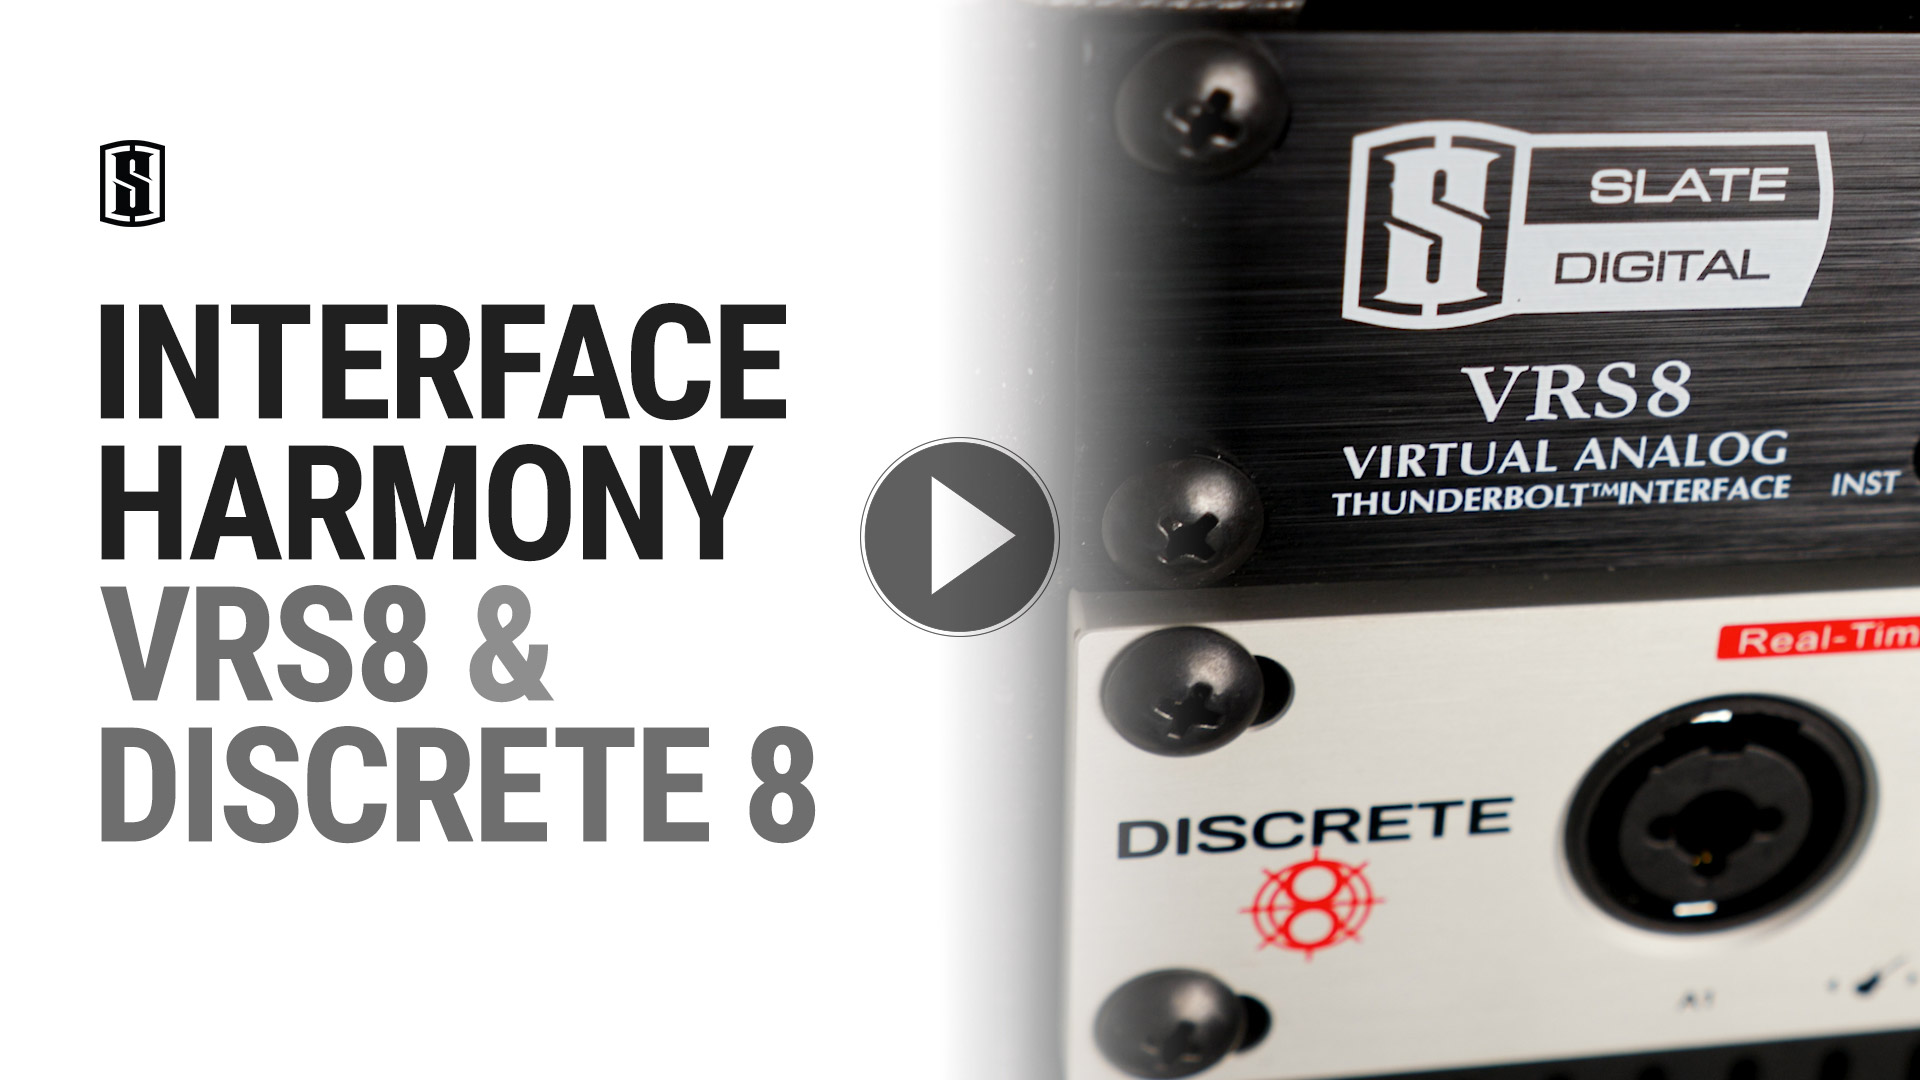 Vrs8 Amp Discrete 8